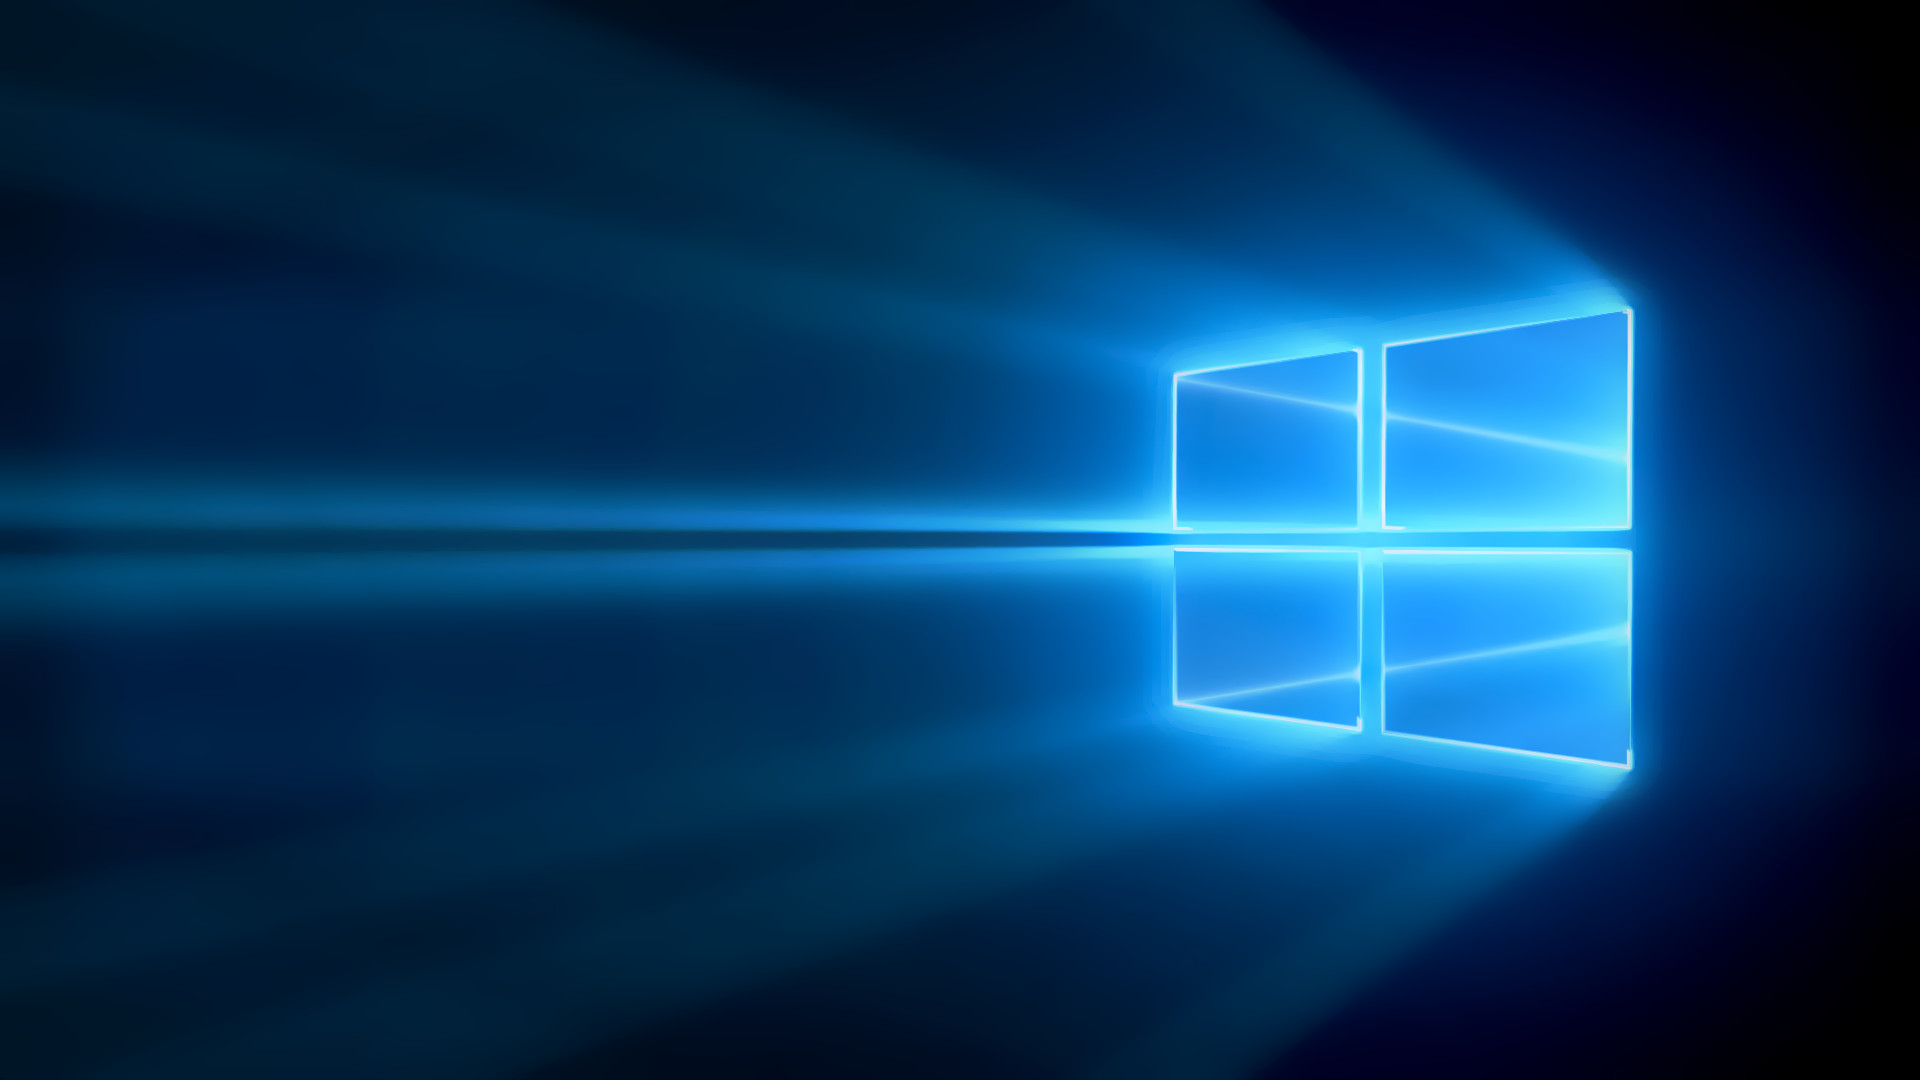 Windows 10 Hero Wallpaper Hd 70 Images